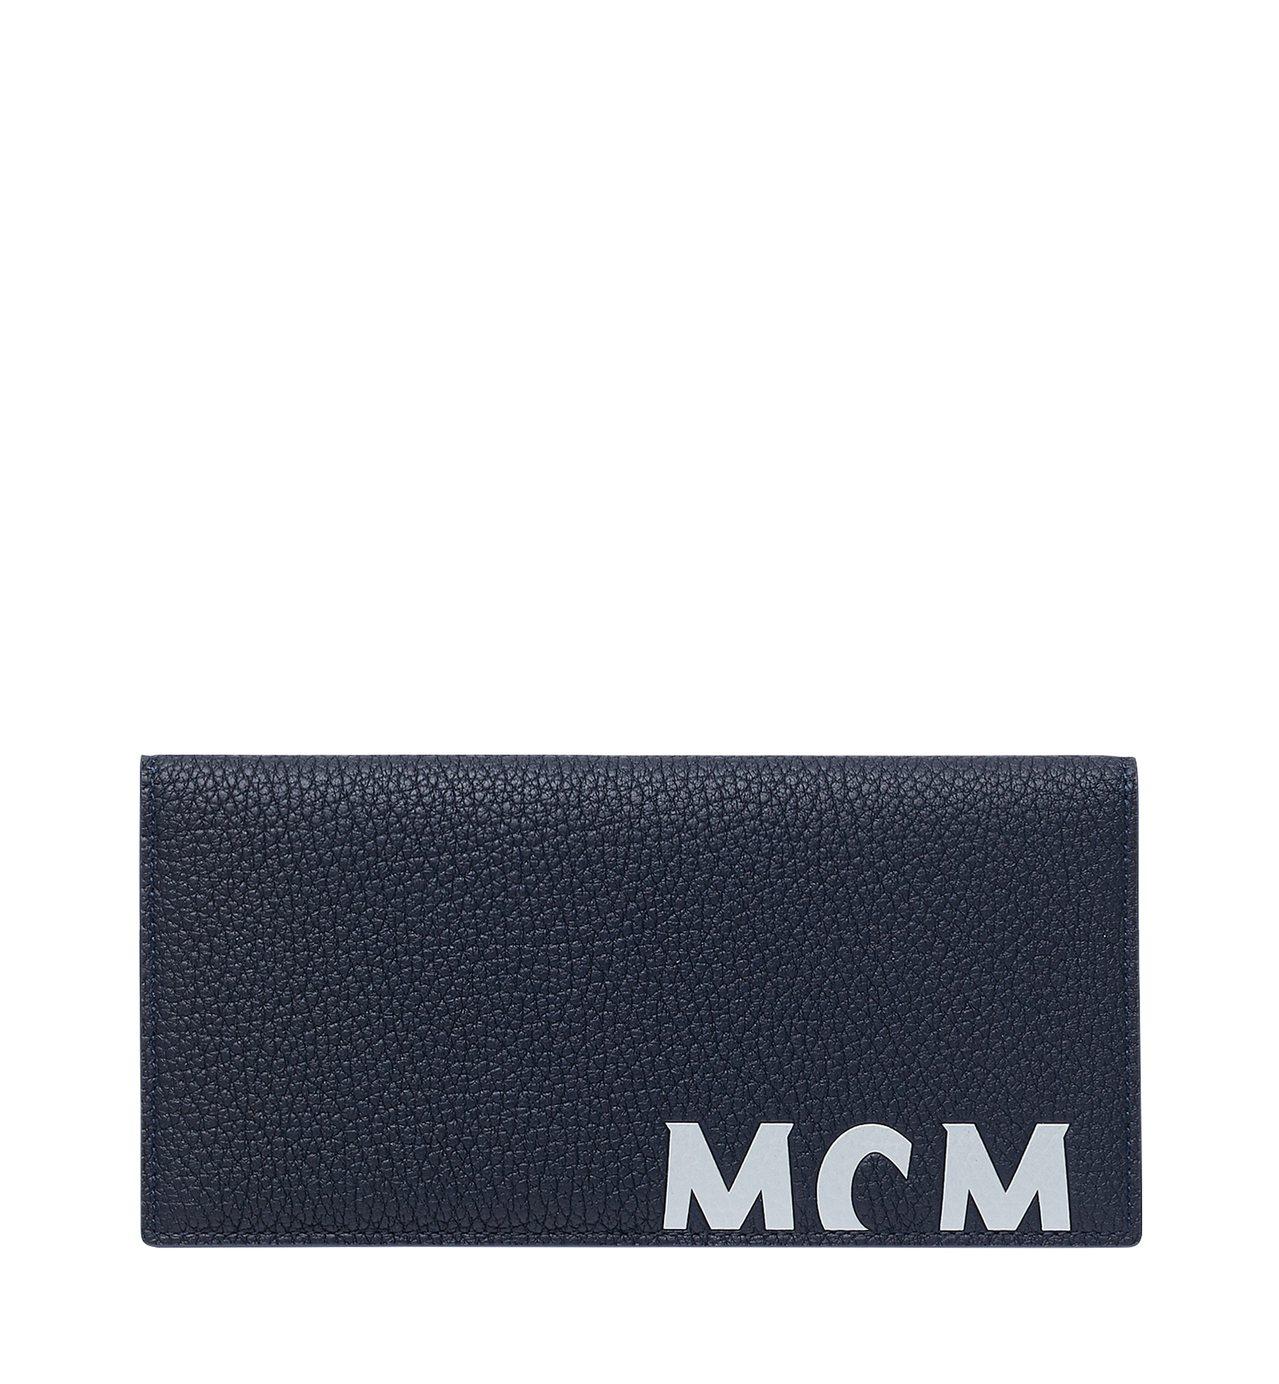 MCM Logo長夾,售價11,000元。圖/MCM提供